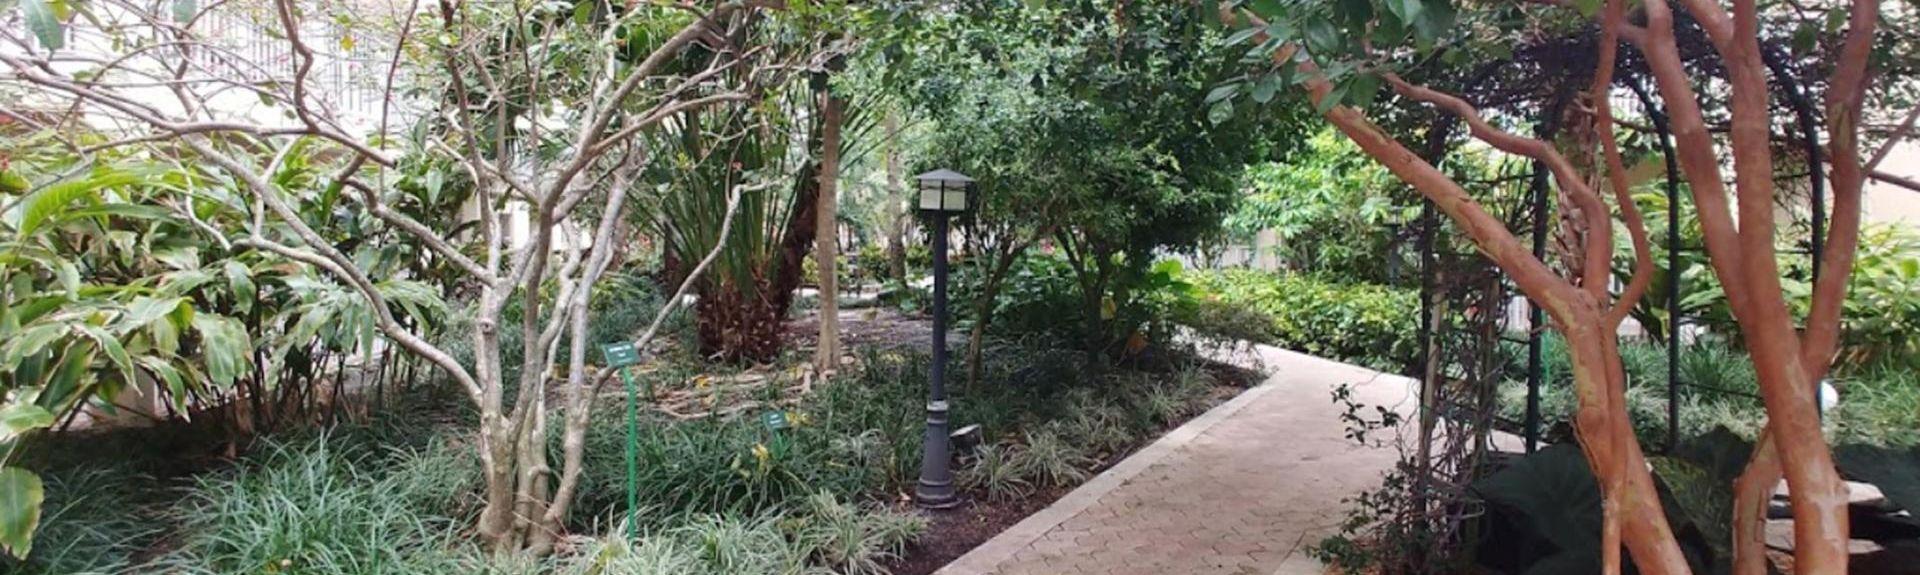 Wyndham Sea Gardens, Pompano Beach, FL, USA